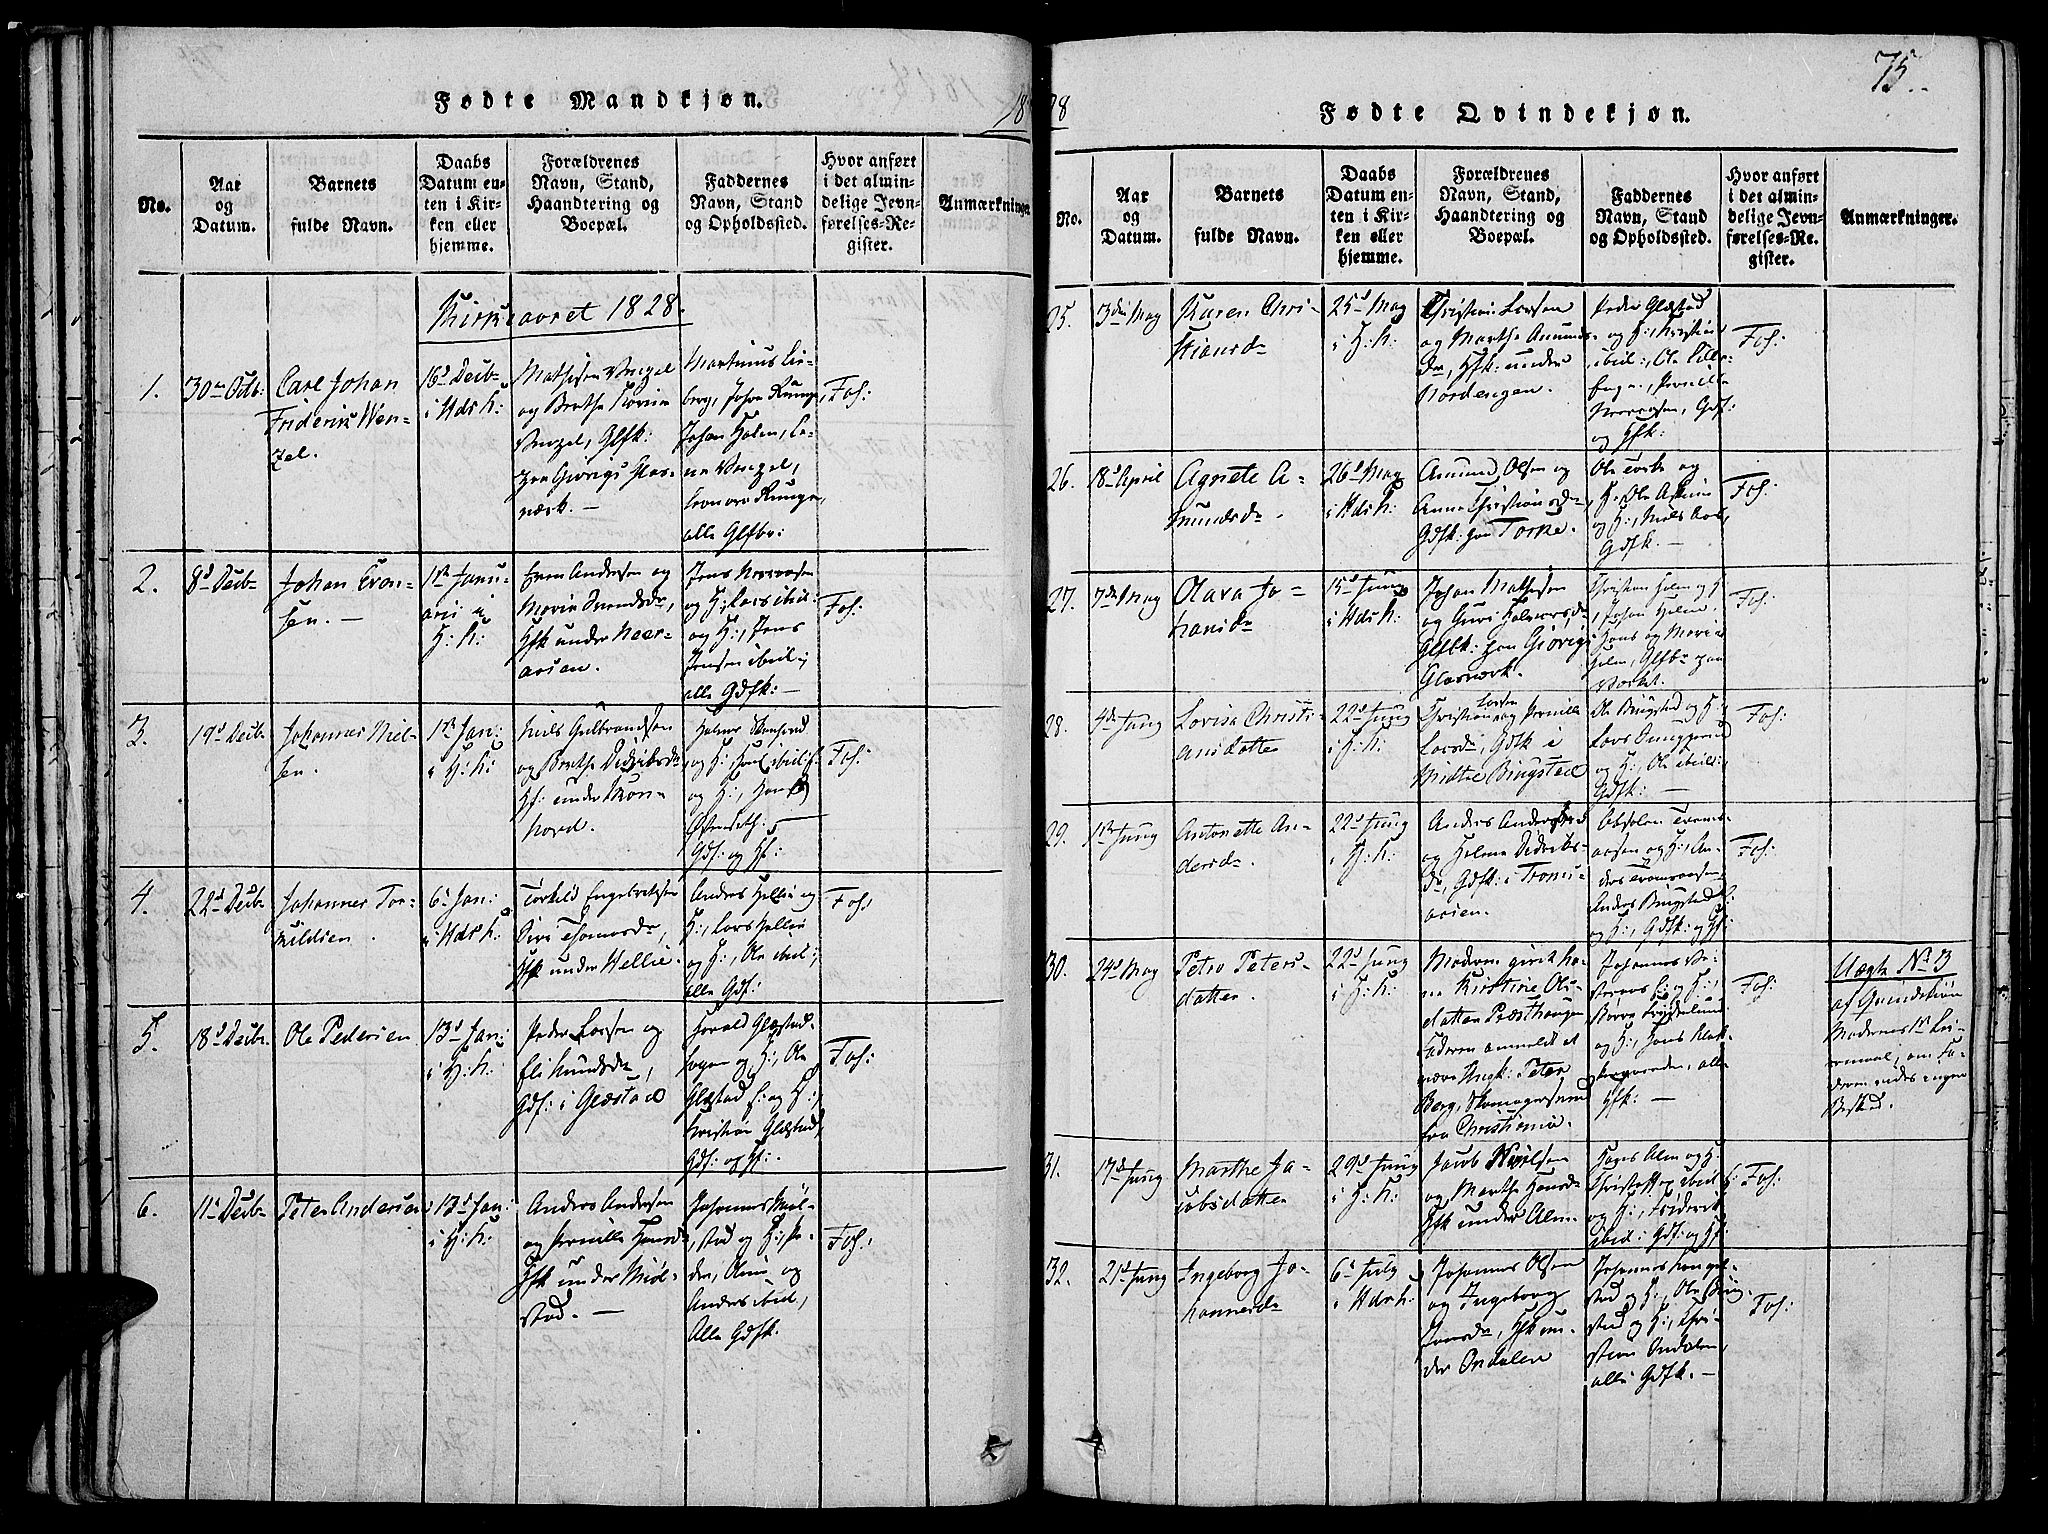 SAH, Vardal prestekontor, H/Ha/Haa/L0004: Ministerialbok nr. 4, 1814-1831, s. 75